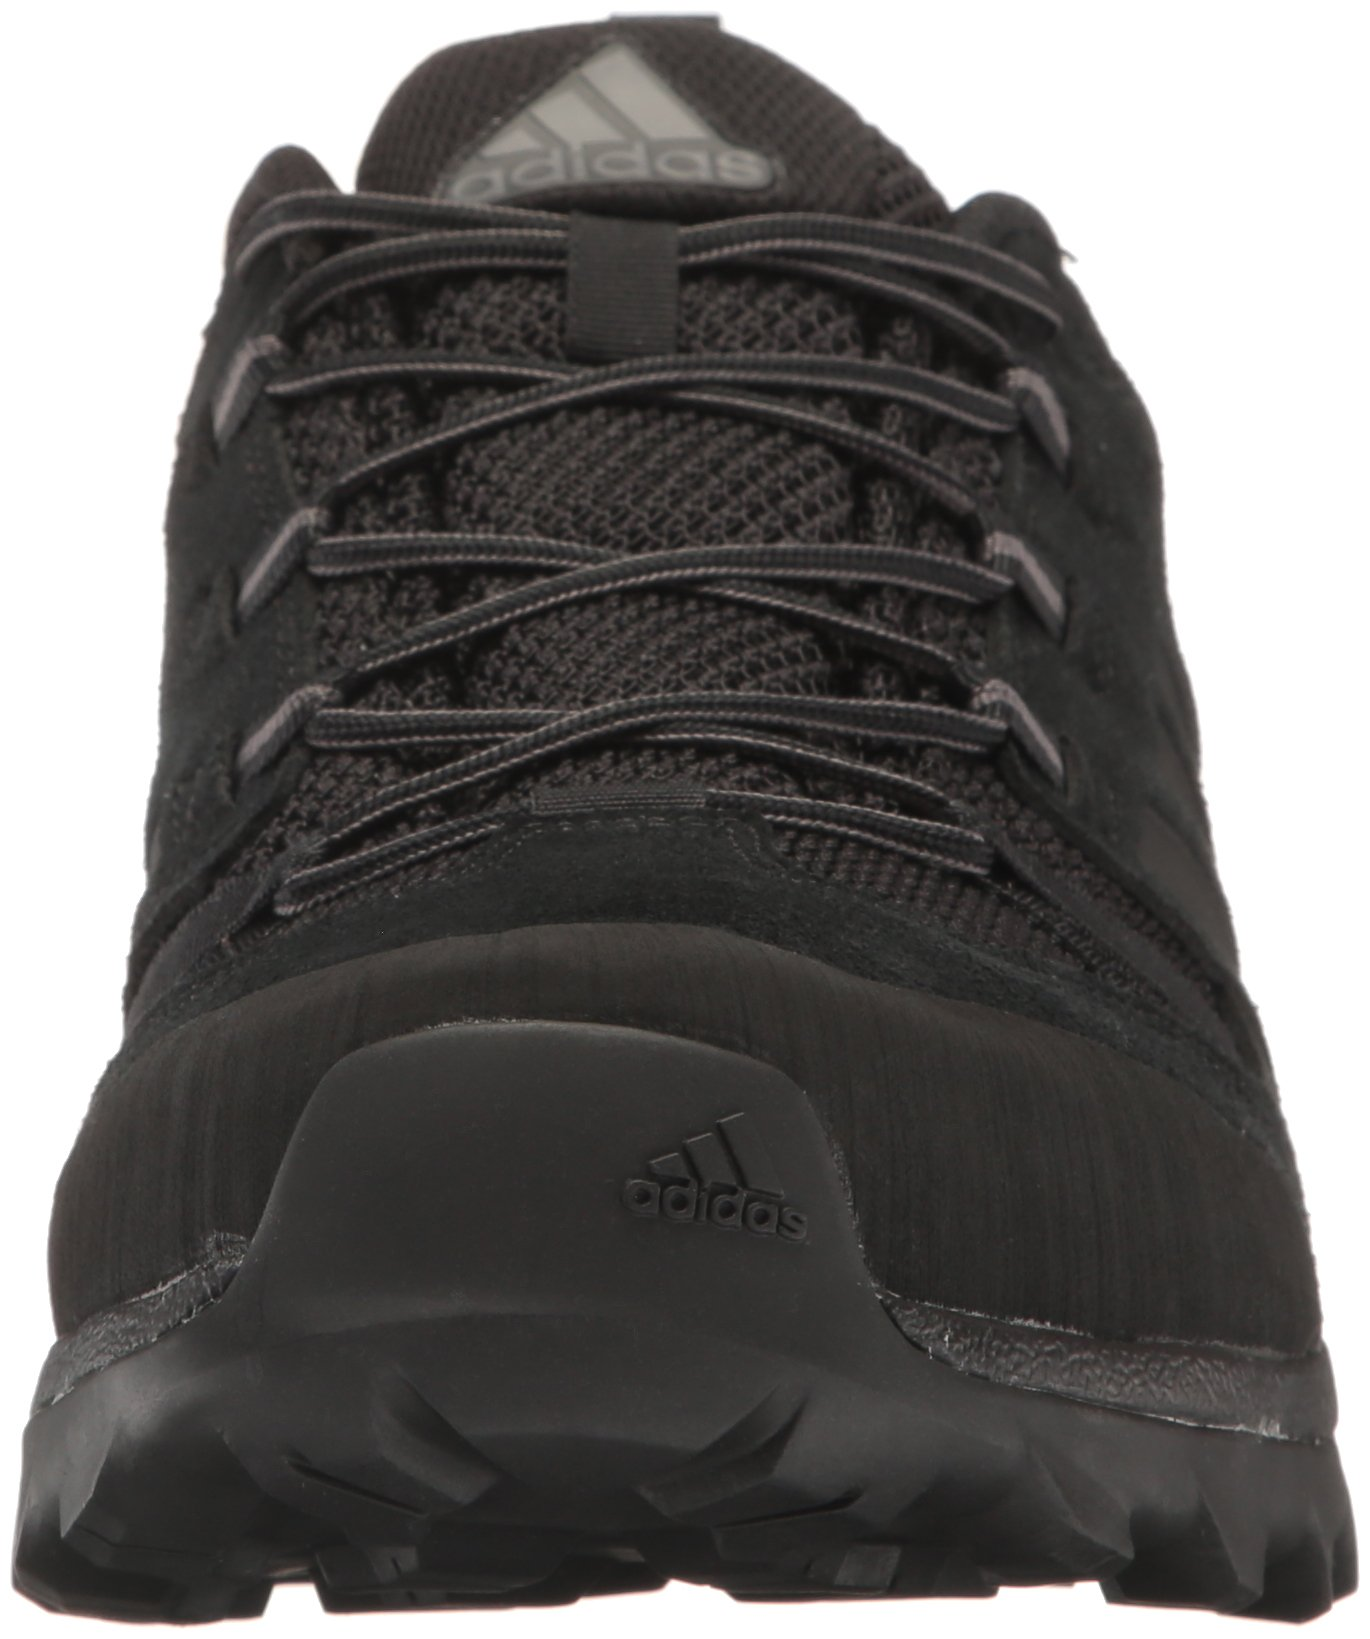 39a60be7a8e9b adidas outdoor Men's Caprock Hiking Shoe, Black/Granite/Night met ...